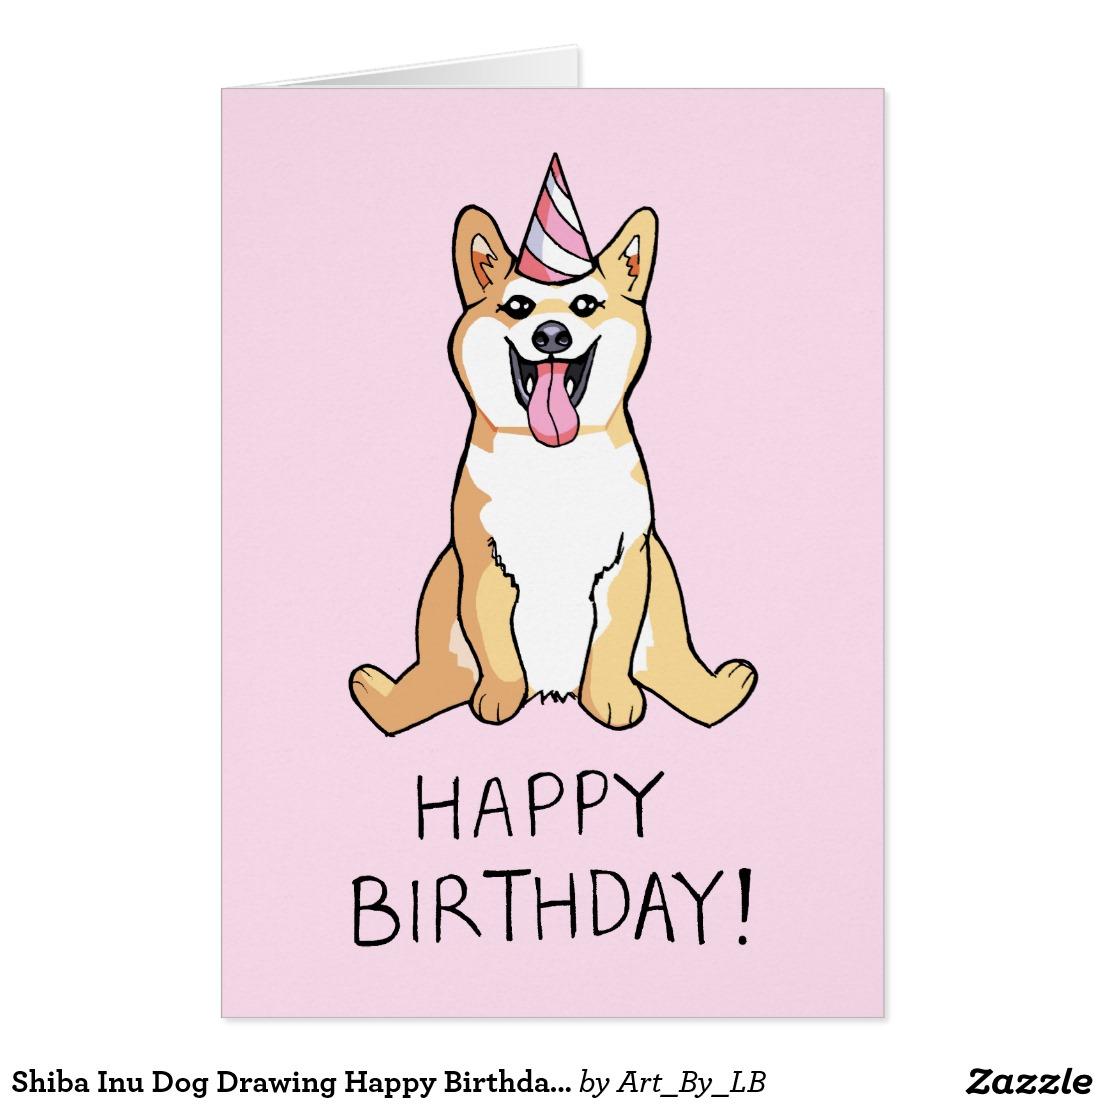 Drawn pug birthday card Happy birthday Shiba Shiba Drawing